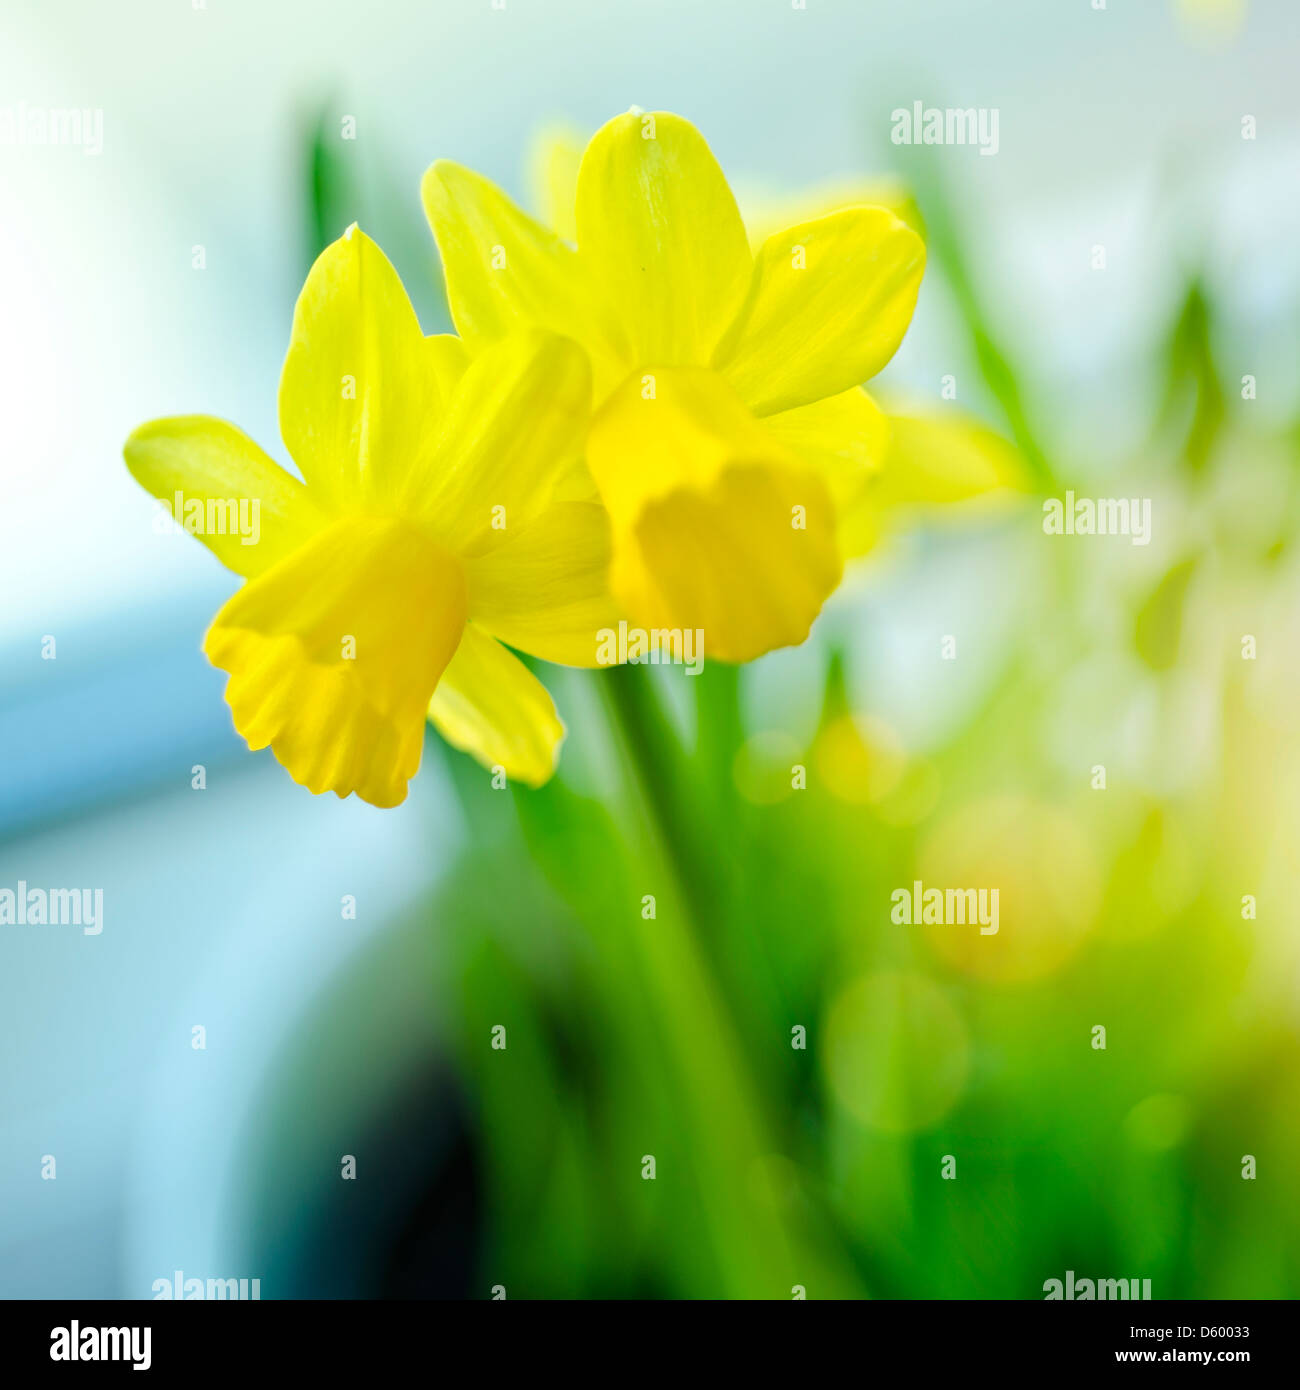 Spring Daffodils on a windowsill. - Stock Image